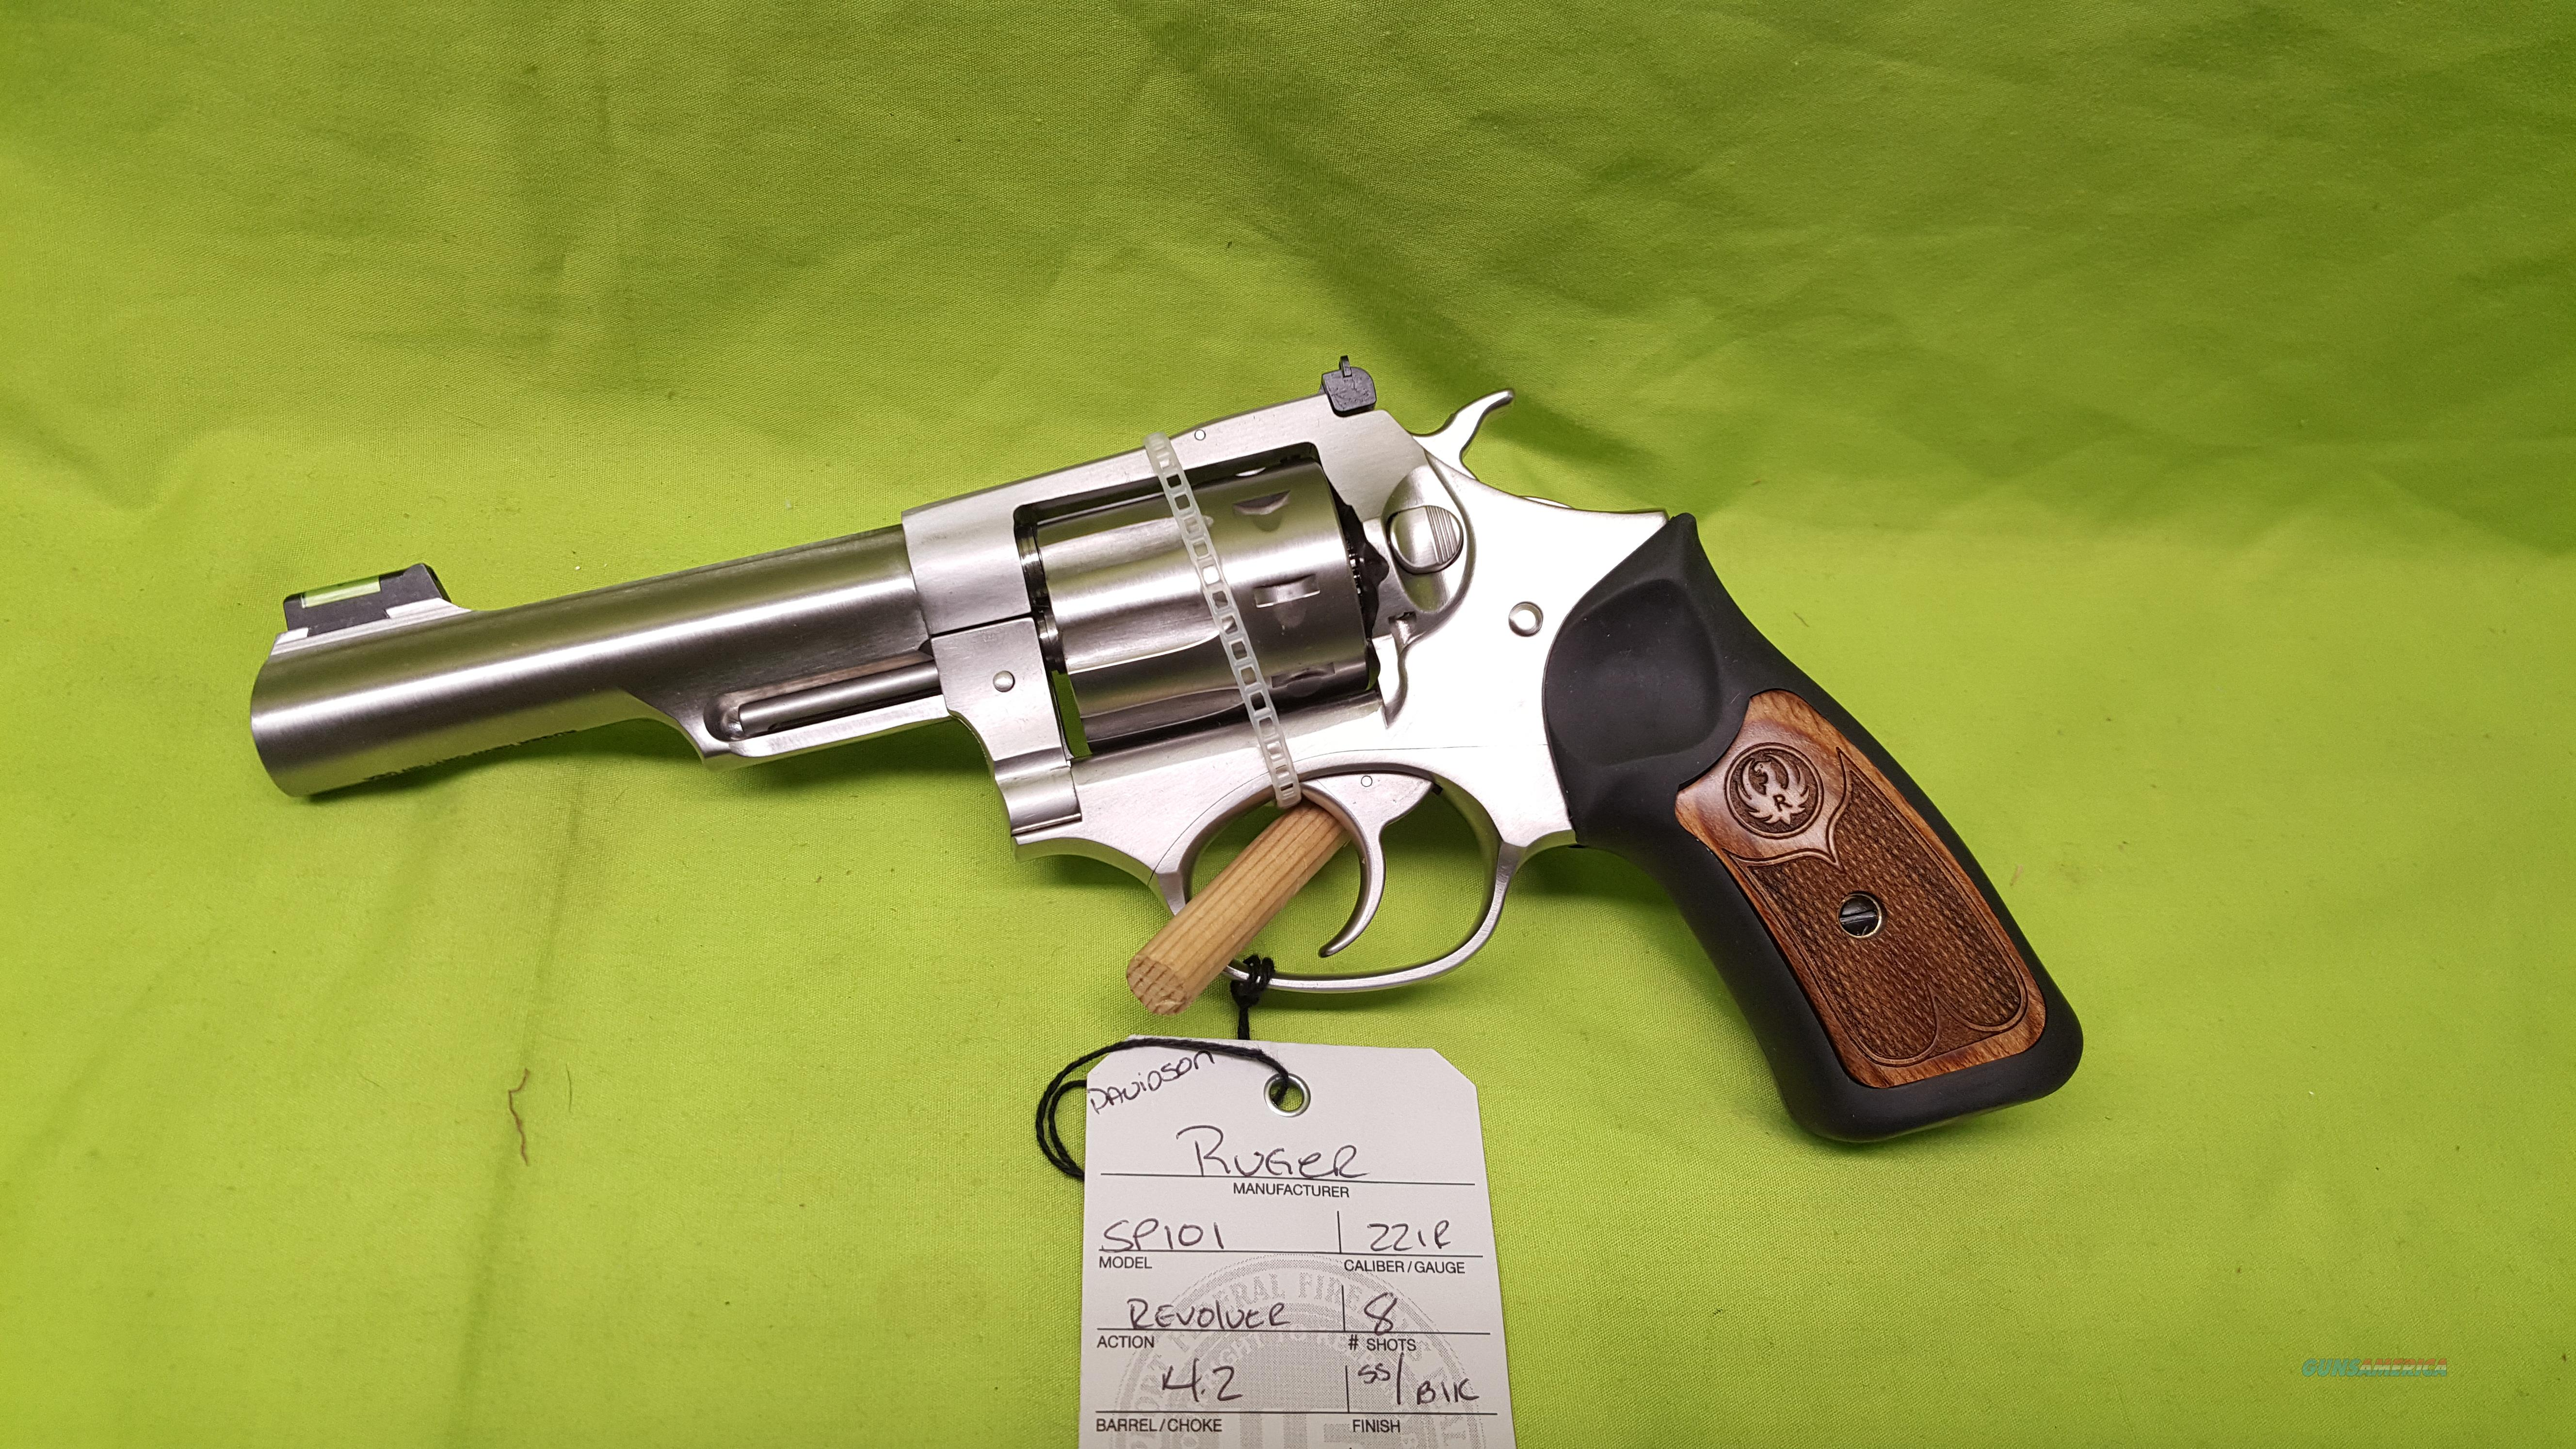 RUGER SP101 SP 101 22 LR REVOLVER 4.2 STAINLESS  Guns > Pistols > Ruger Double Action Revolver > SP101 Type